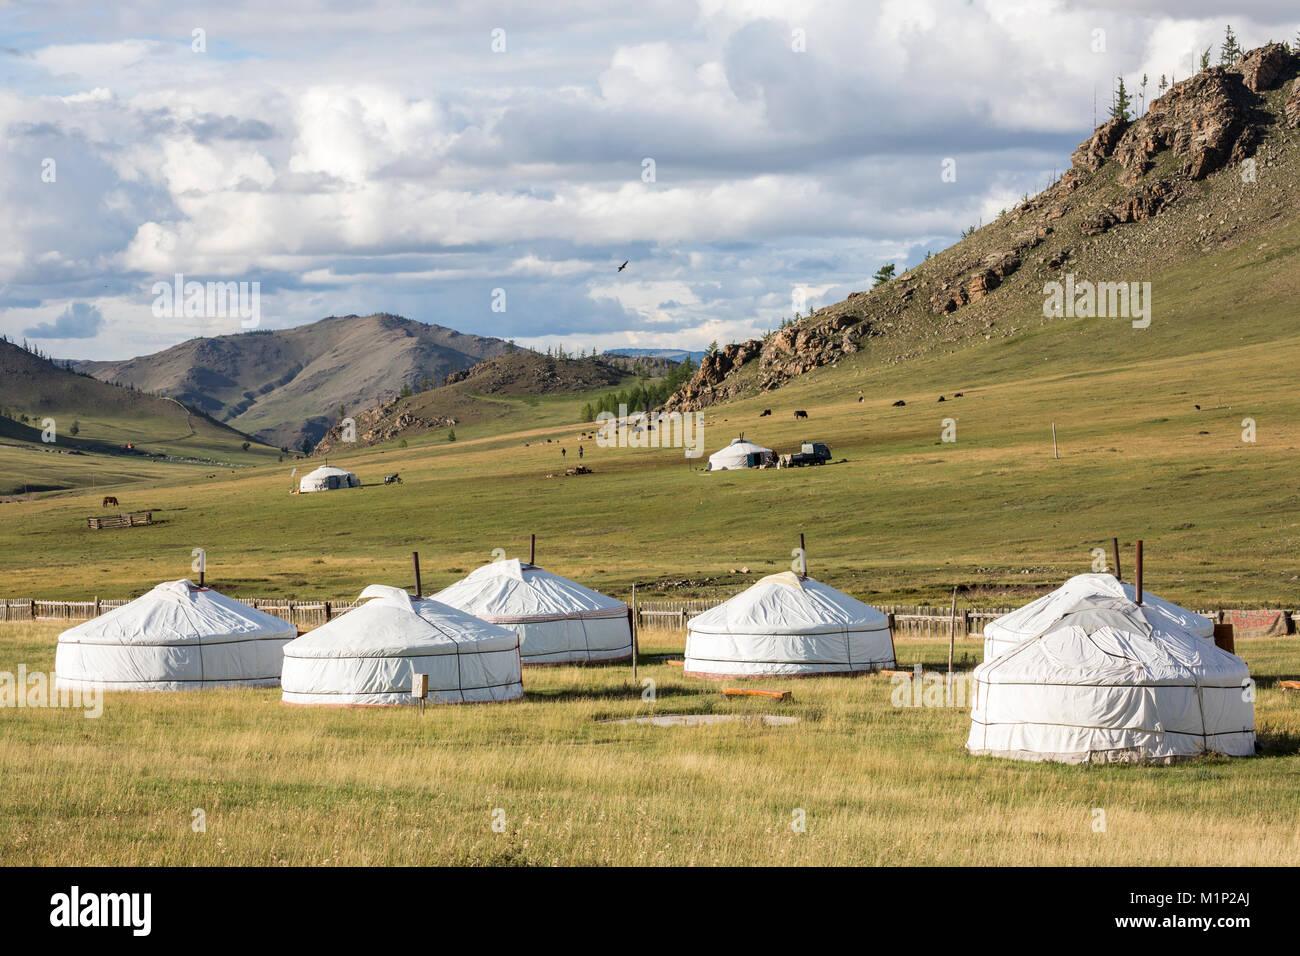 Touristische Ger camp und Khangai Gebirge, Burentogtokh Bezirk, Provinz Hovsgol, Mongolei, Zentralasien, Asien Stockbild